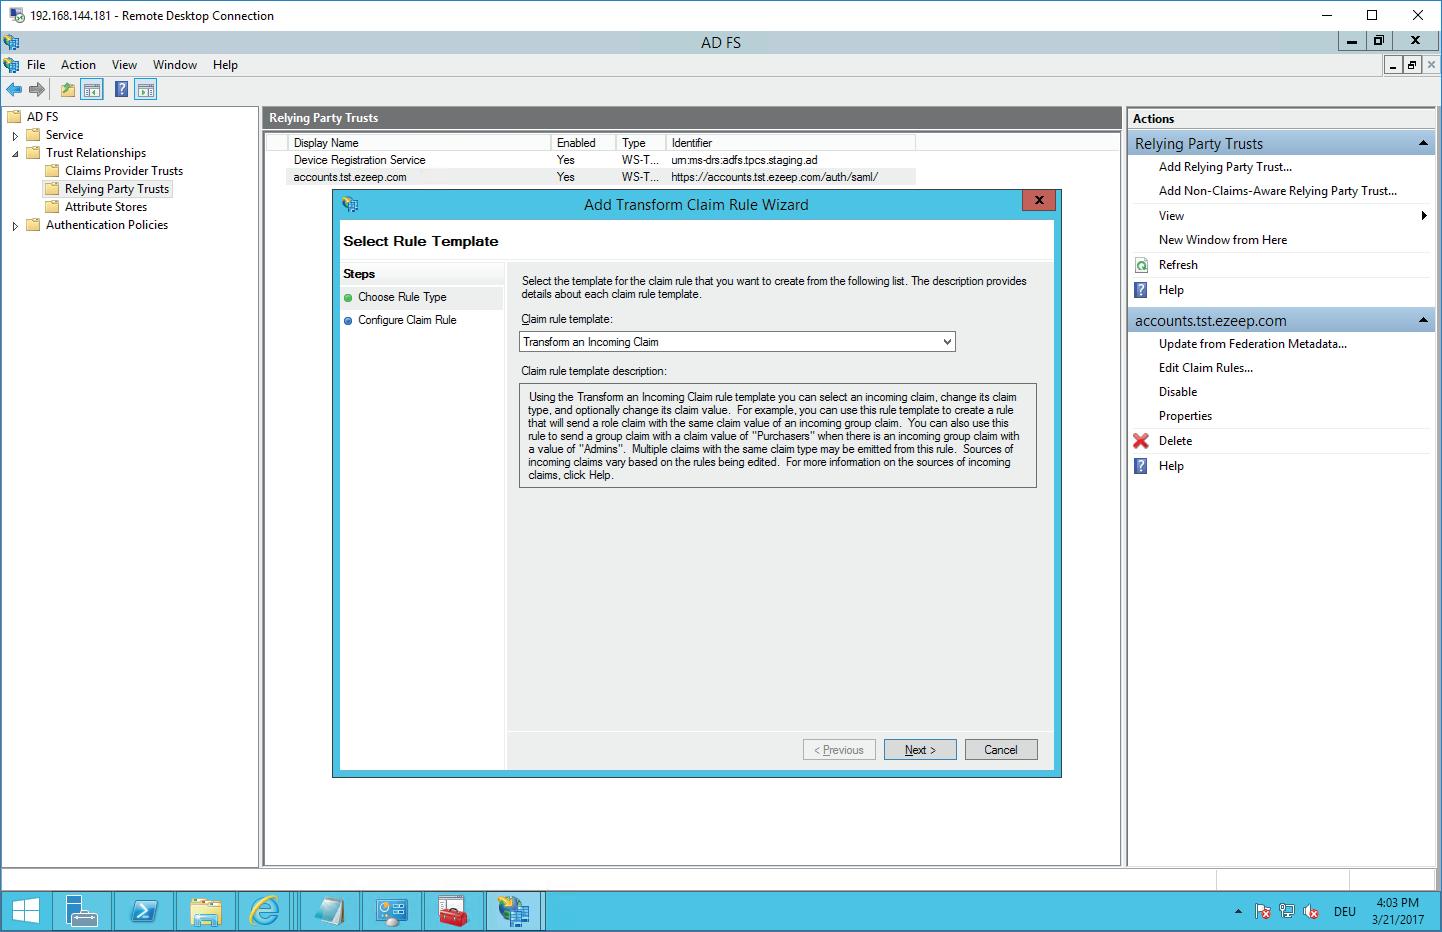 screenshot: select the claim rule template